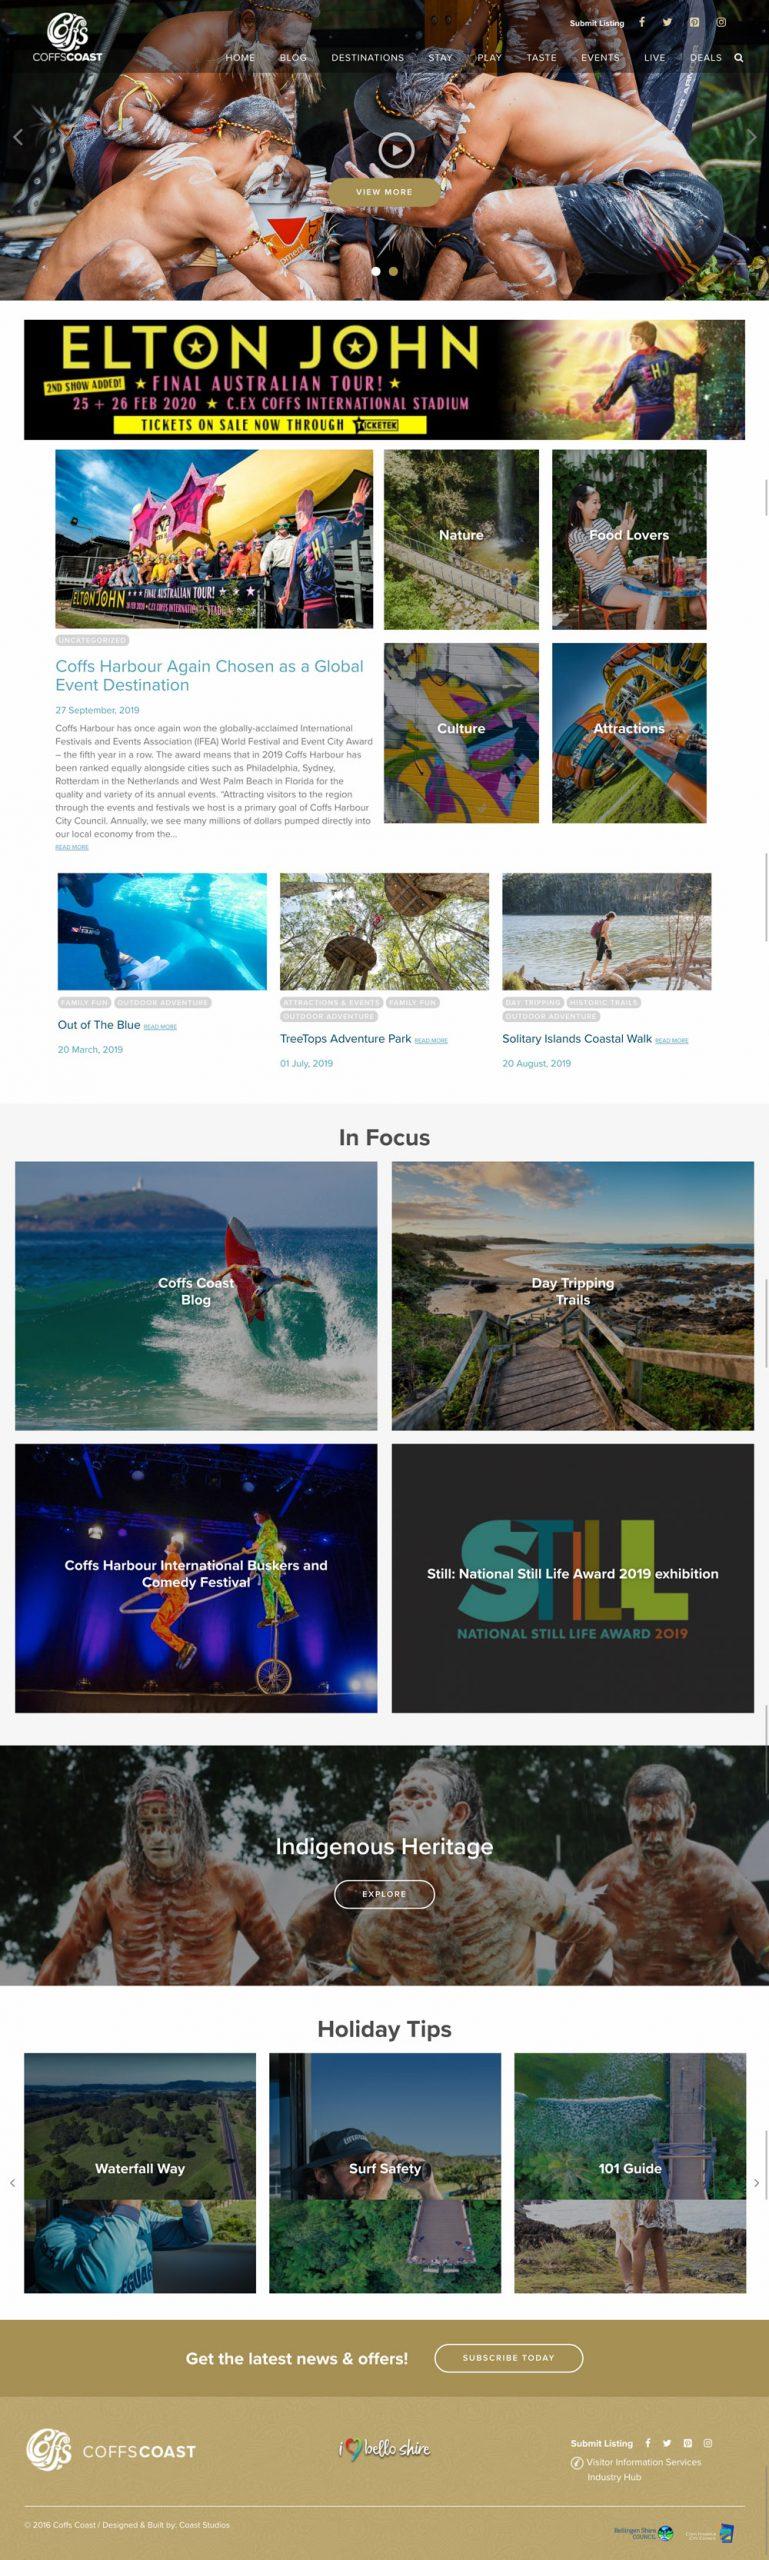 Website Design & Development for Coffs Coast